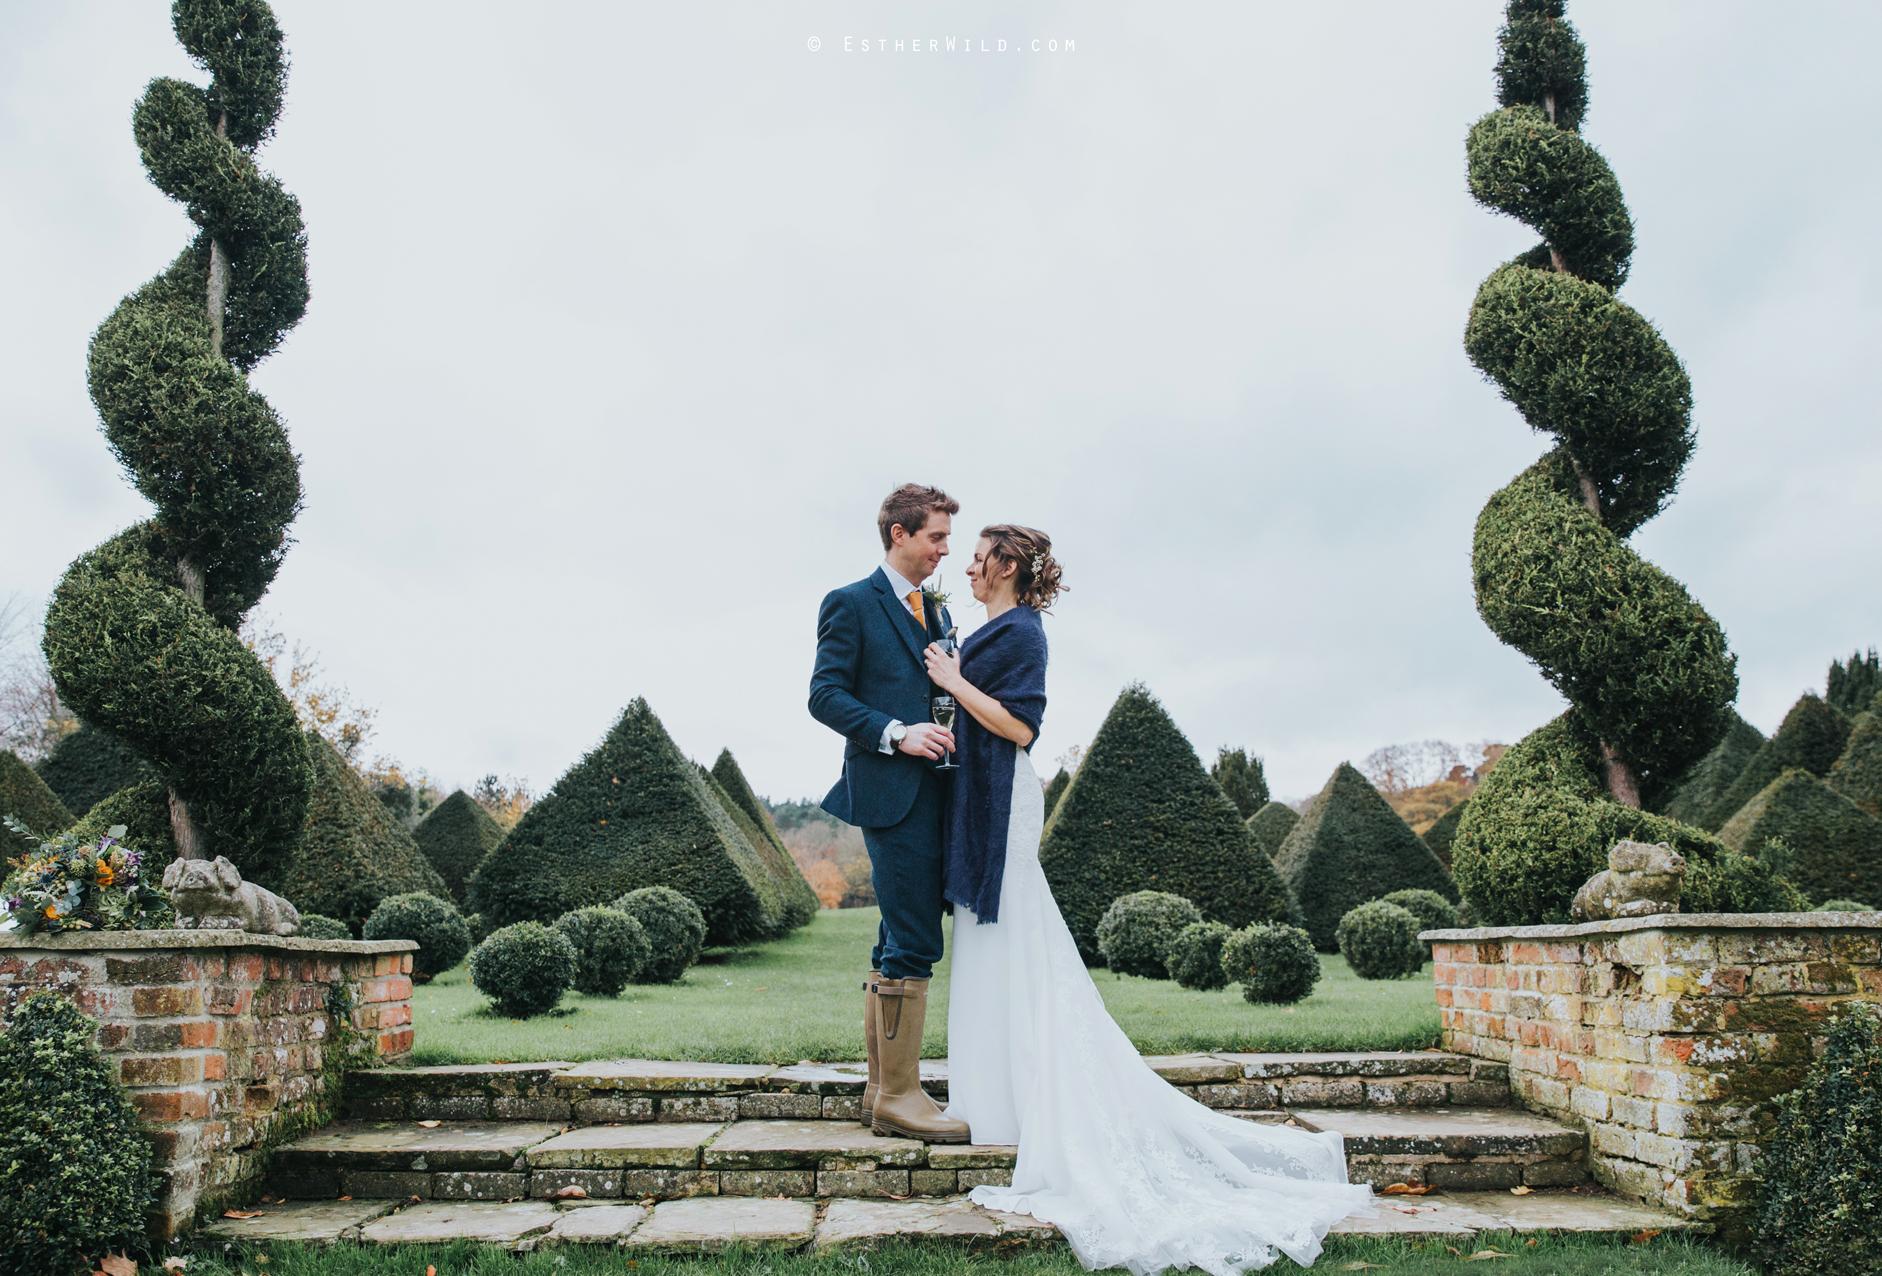 1117_Chaucer_Barn_Wedding_Photography_Esther_Wild_Norfolk_Photographer_IMG_1007.jpg